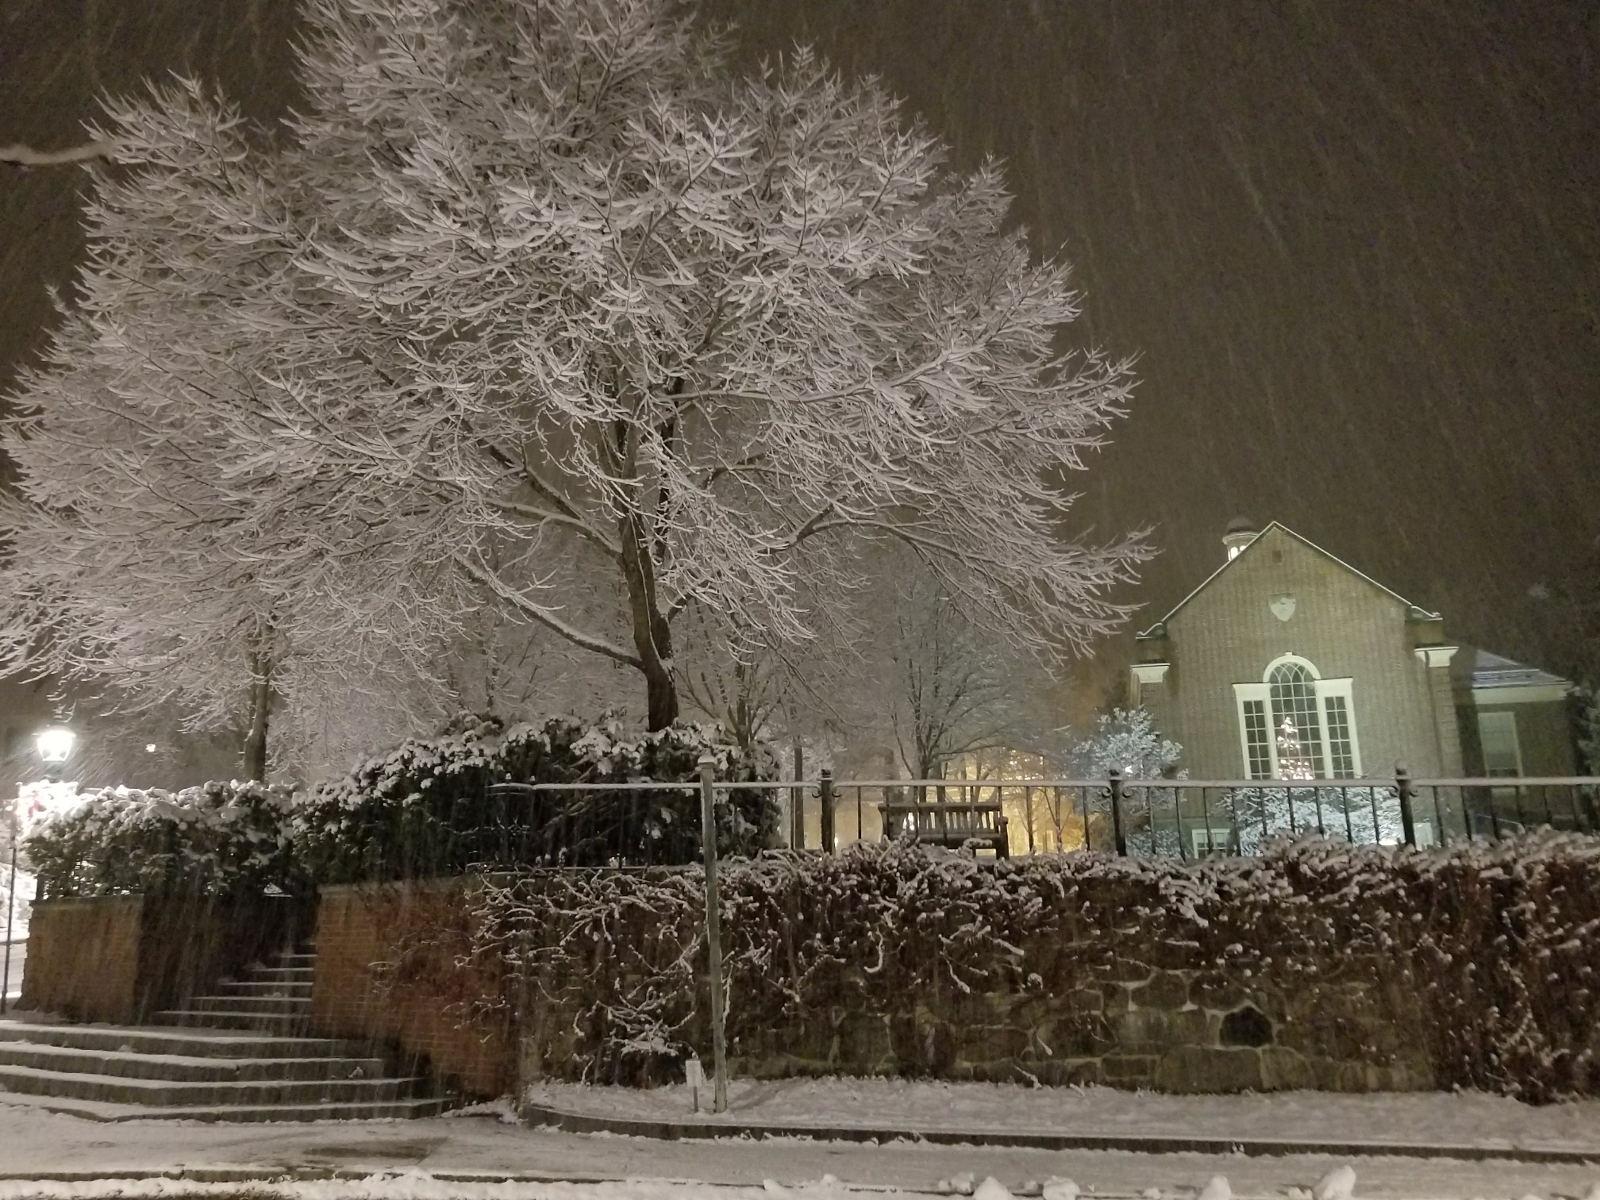 Snowy night in Camden